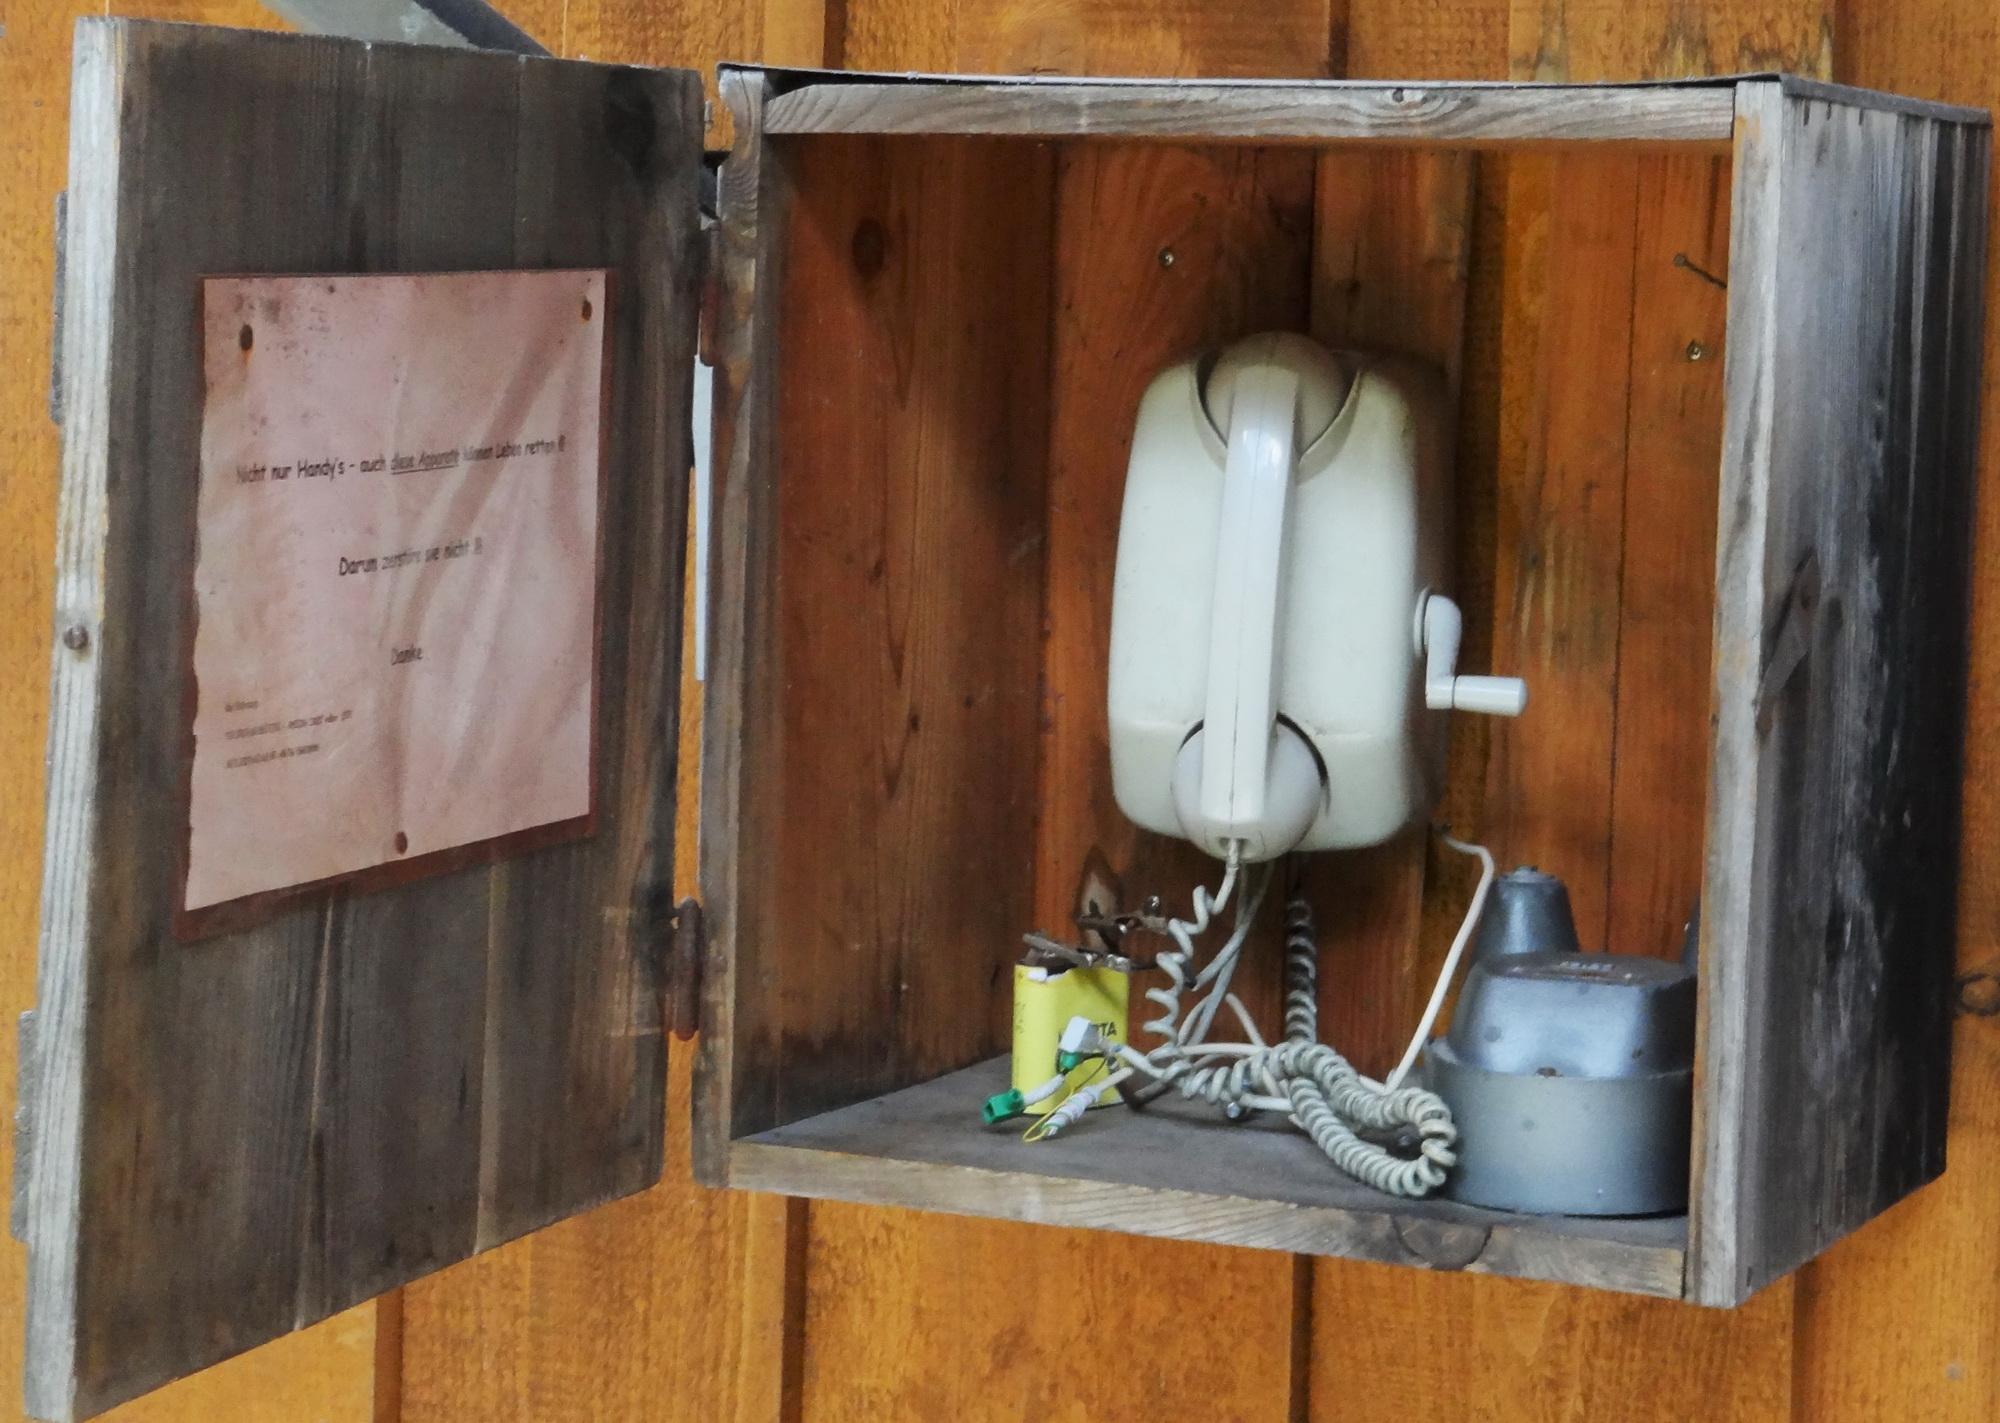 Sulzenau hut telephone